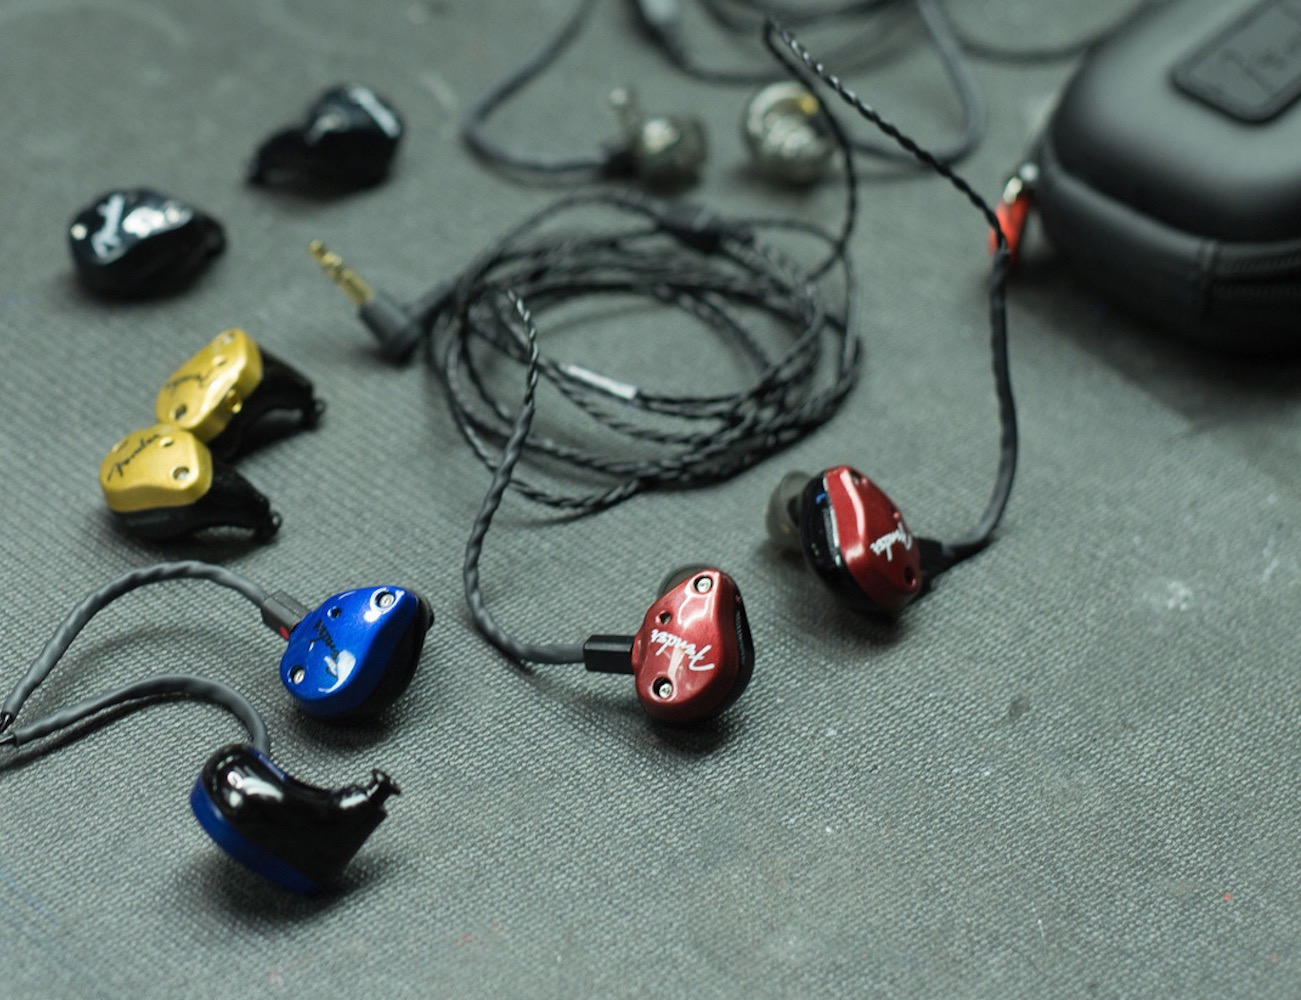 Fender FXA6 Pro In-Ear Monitor Headphones